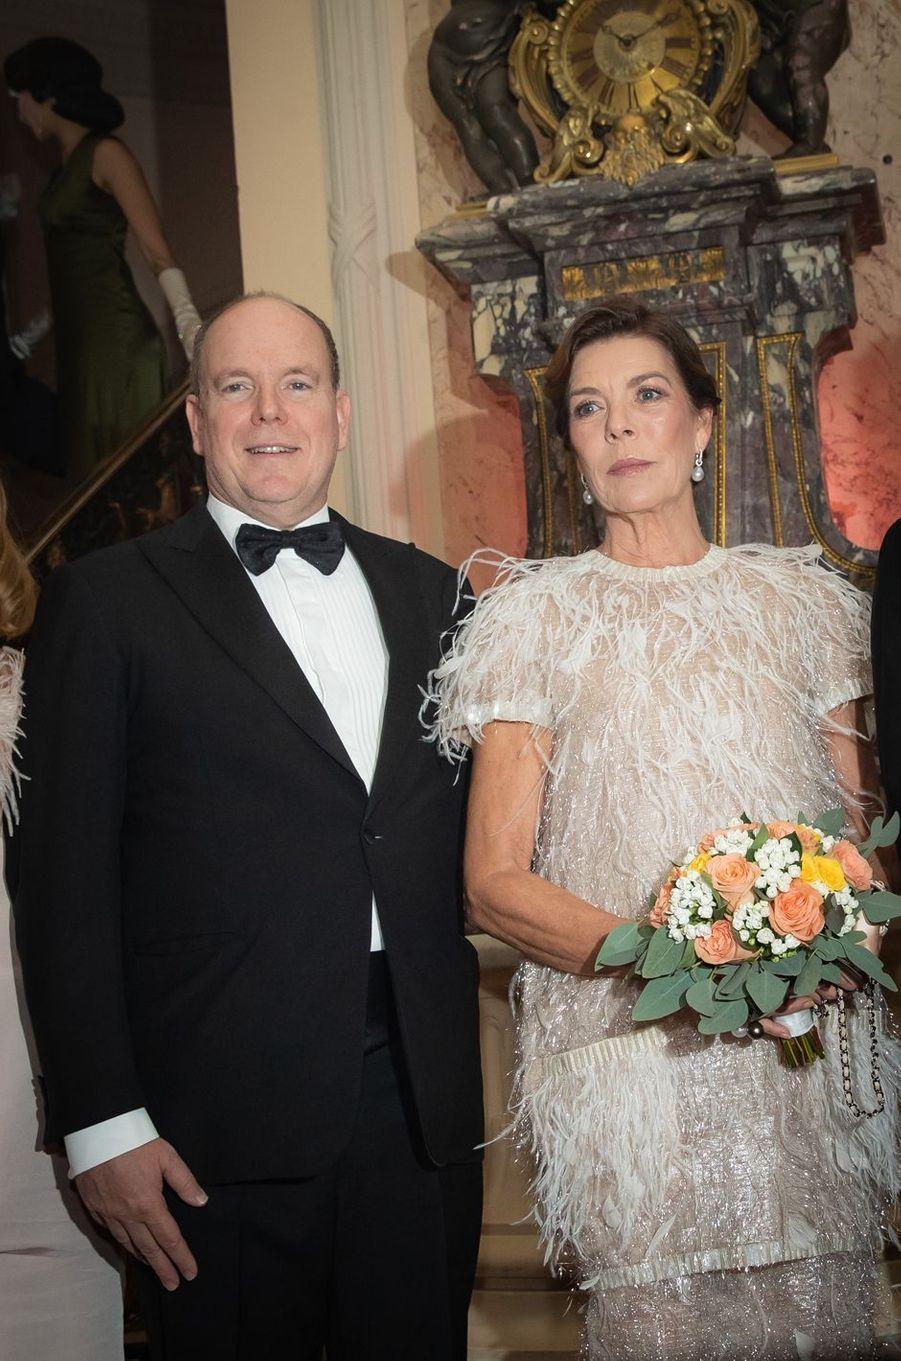 Le prince Albert II de Monaco et la princesse Caroline de Hanovre à Monaco, le 5 octobre 2019